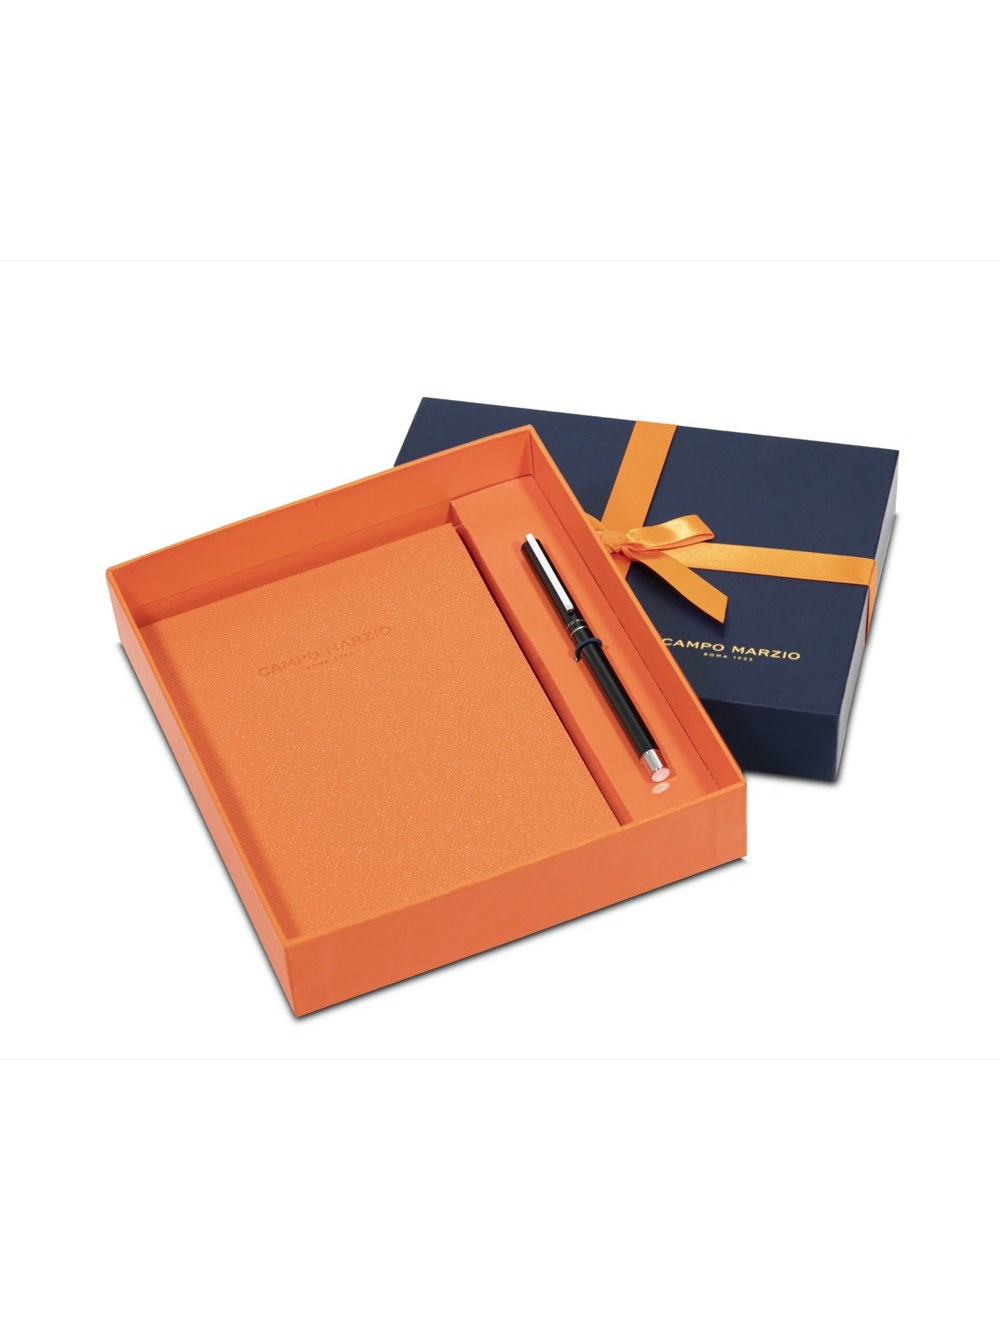 Gift Set Unix and Notes - Mandarin